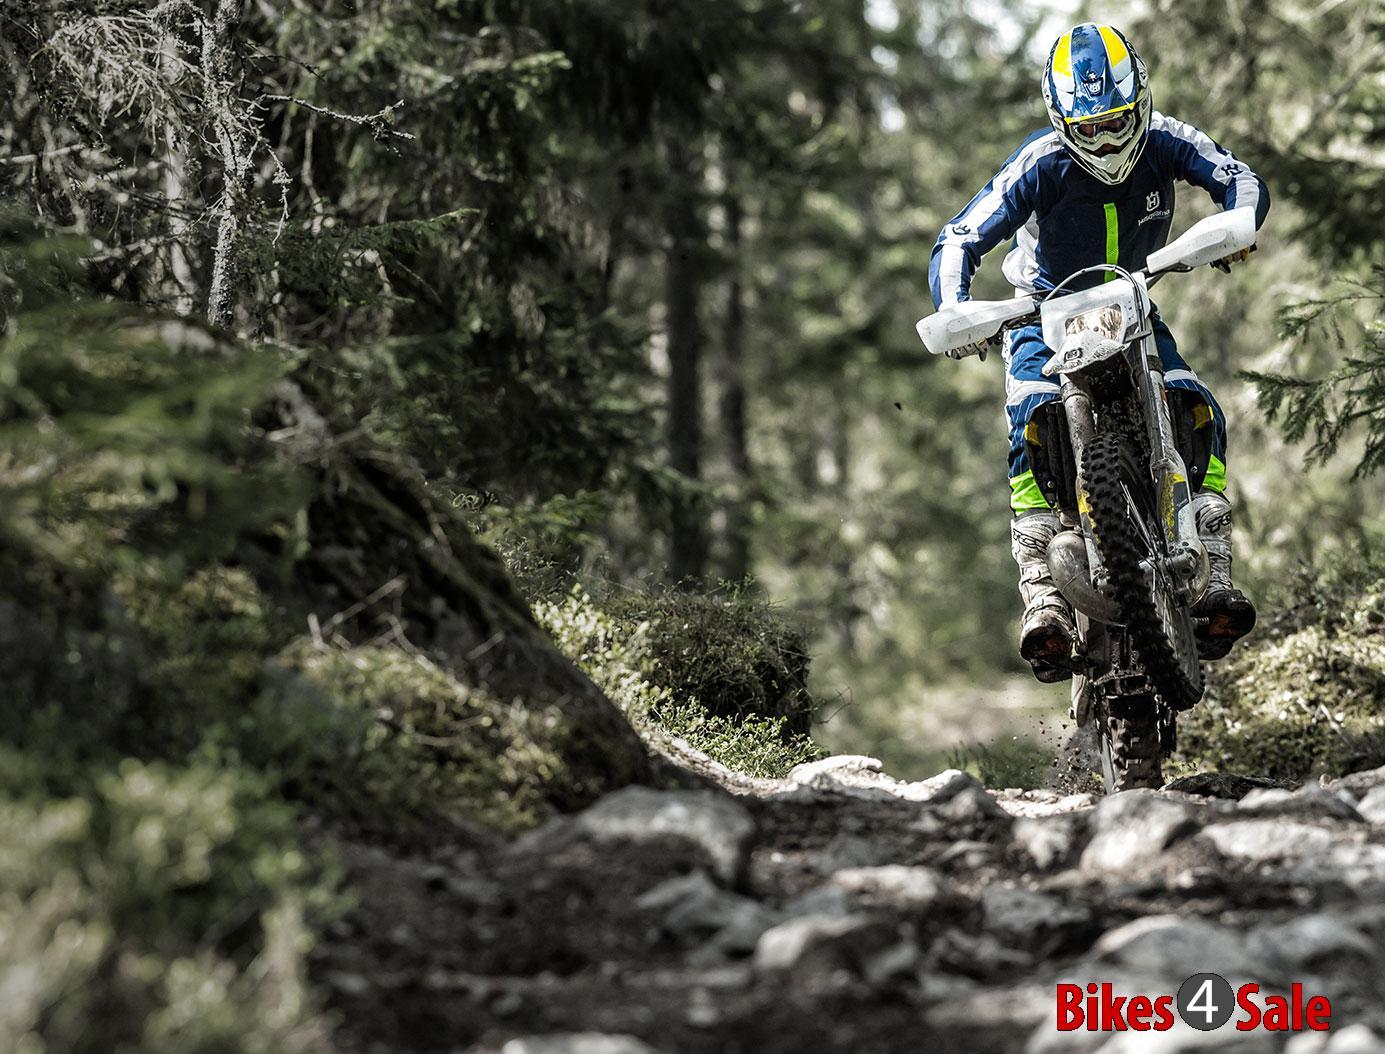 husqvarna dirt bike iphone wallpaper - photo #48